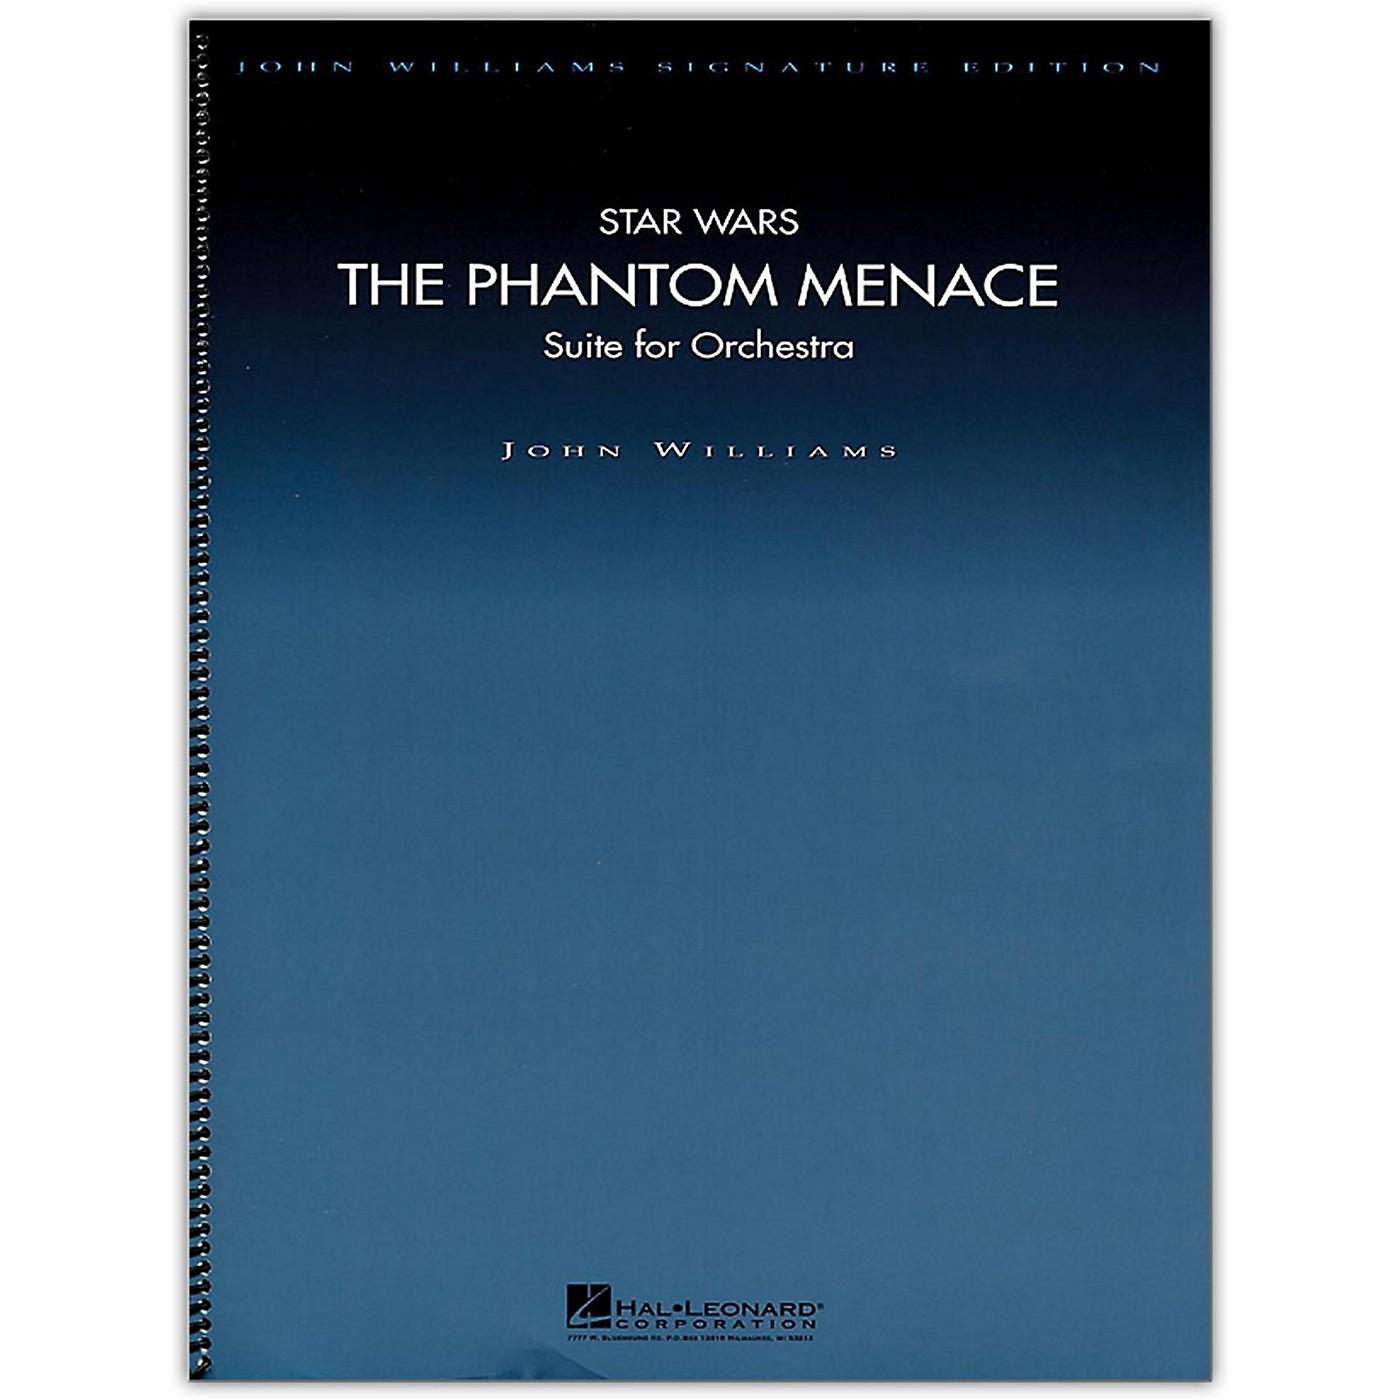 Hal Leonard Star Wars: The Phantom Menace - John Williams Signature Edition Orchestra Deluxe Score thumbnail